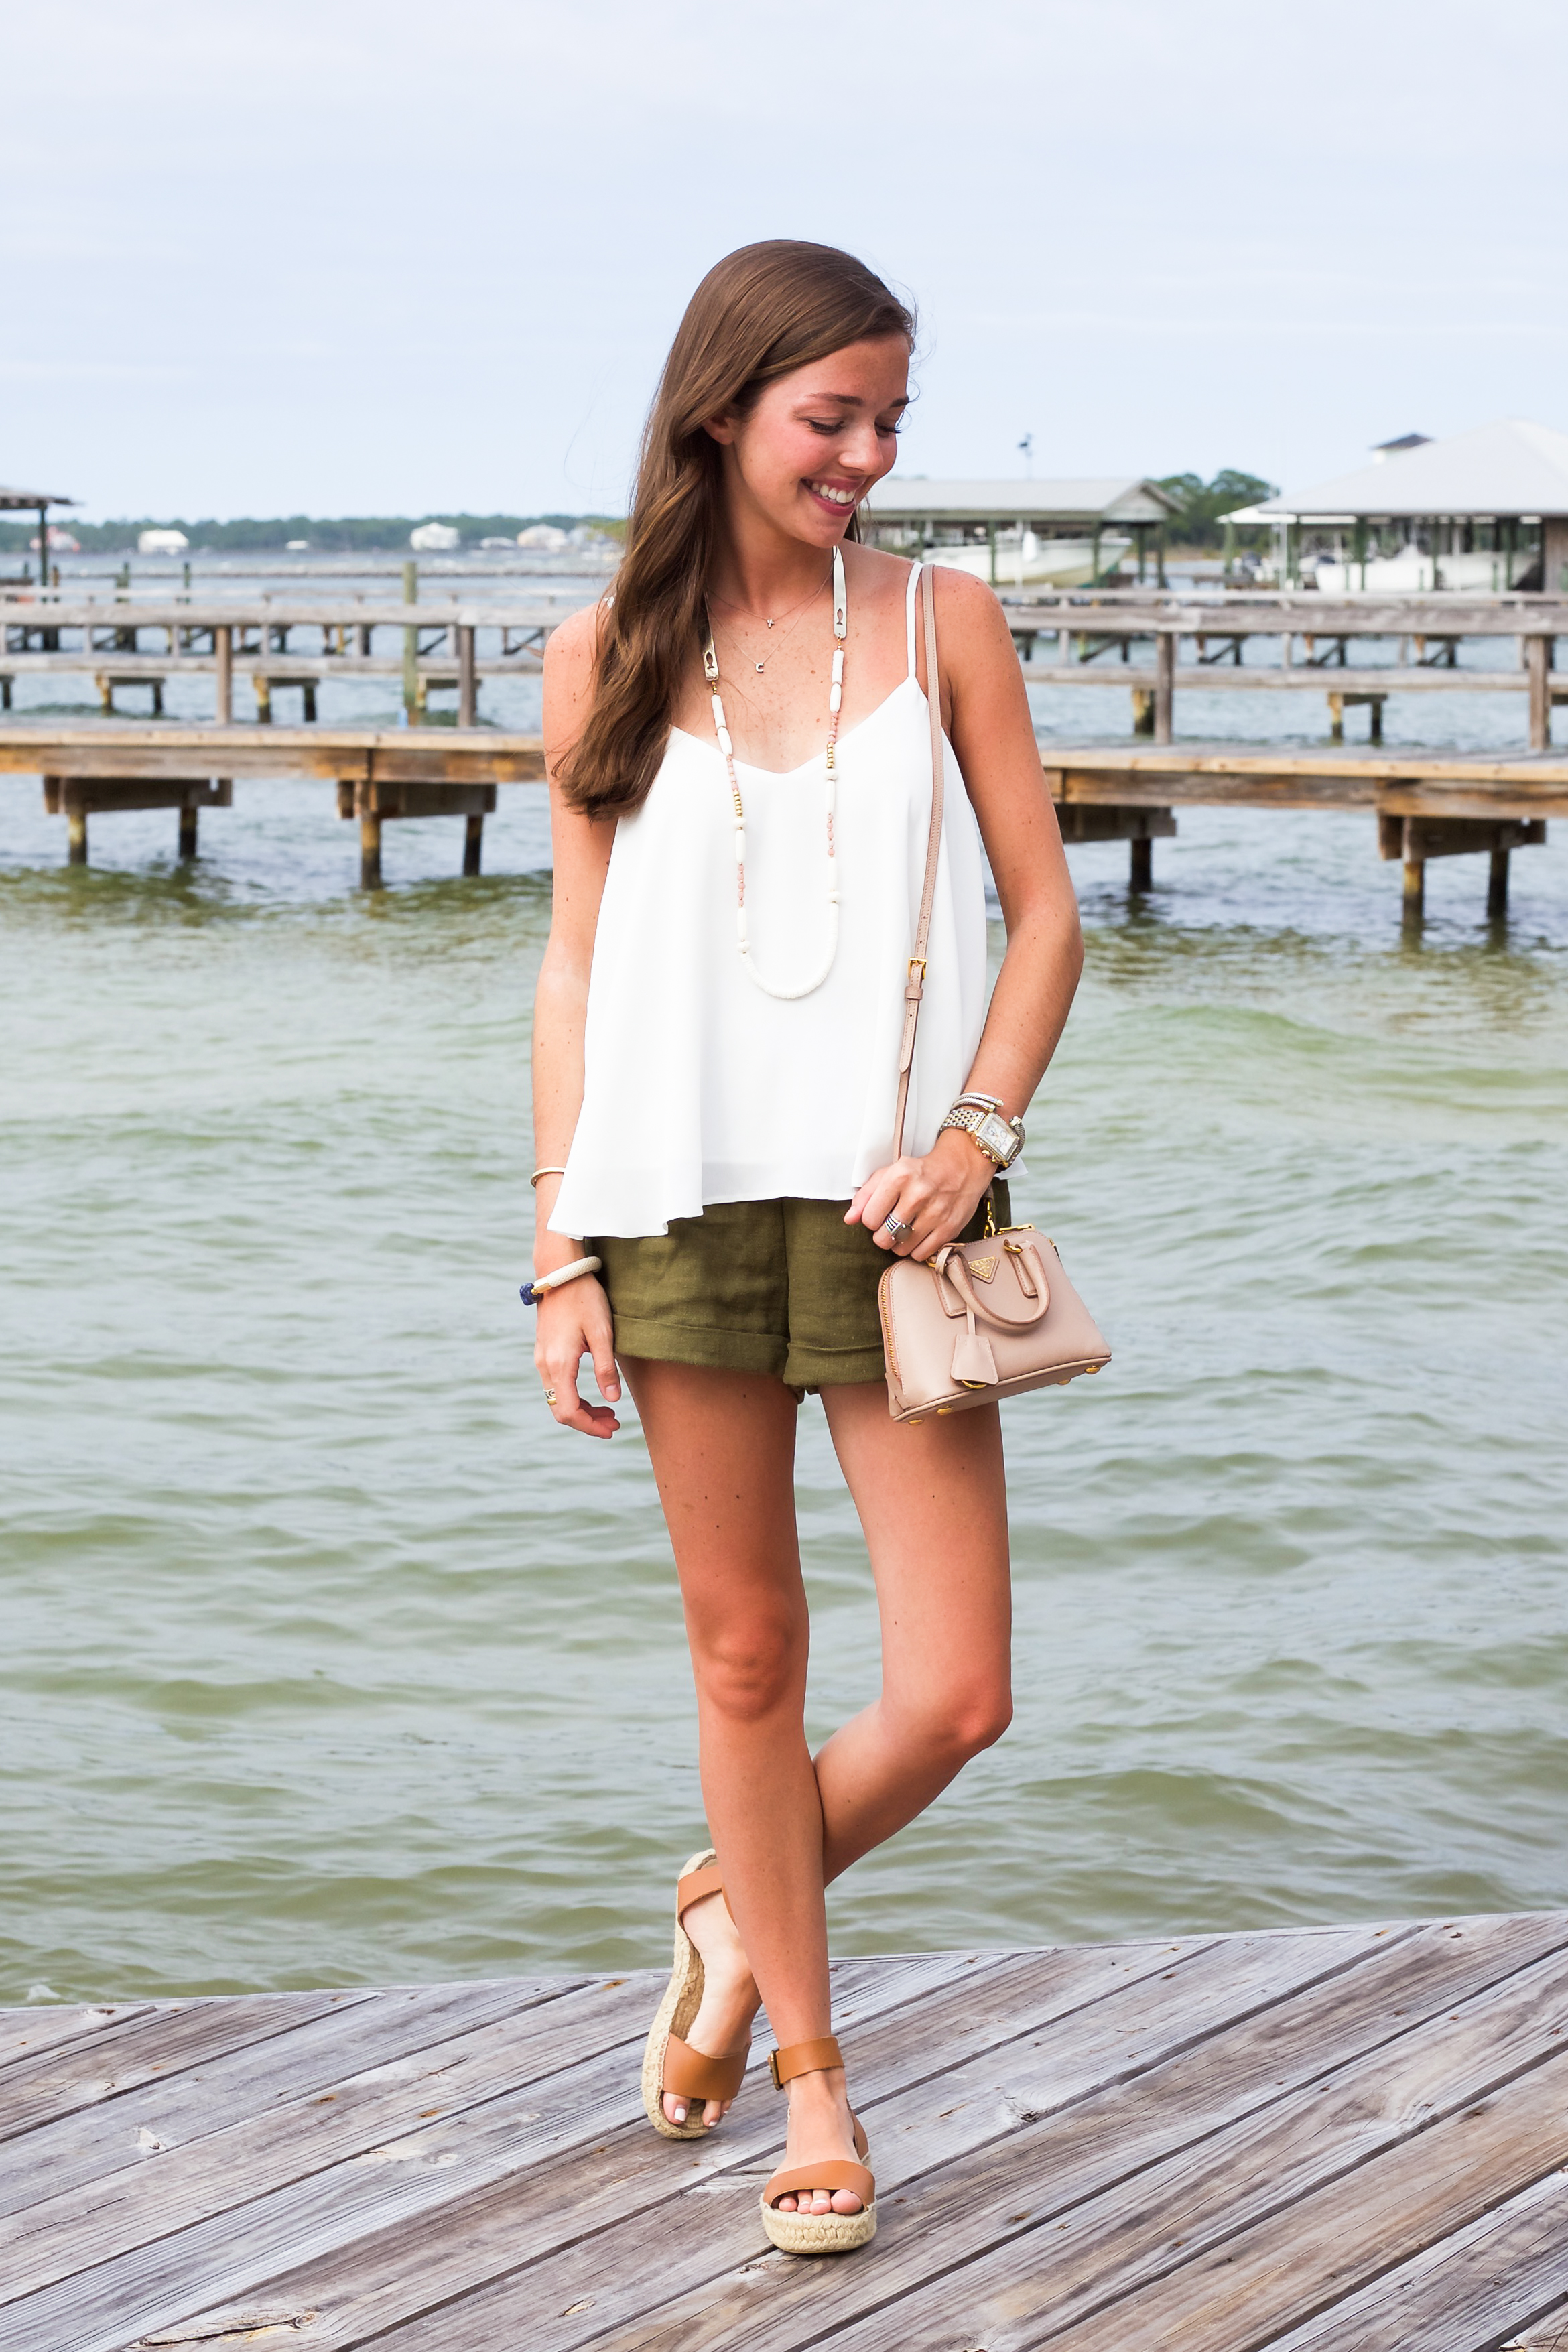 fashion blogger lcb style beach soludos topshop (9 of 21).jpg